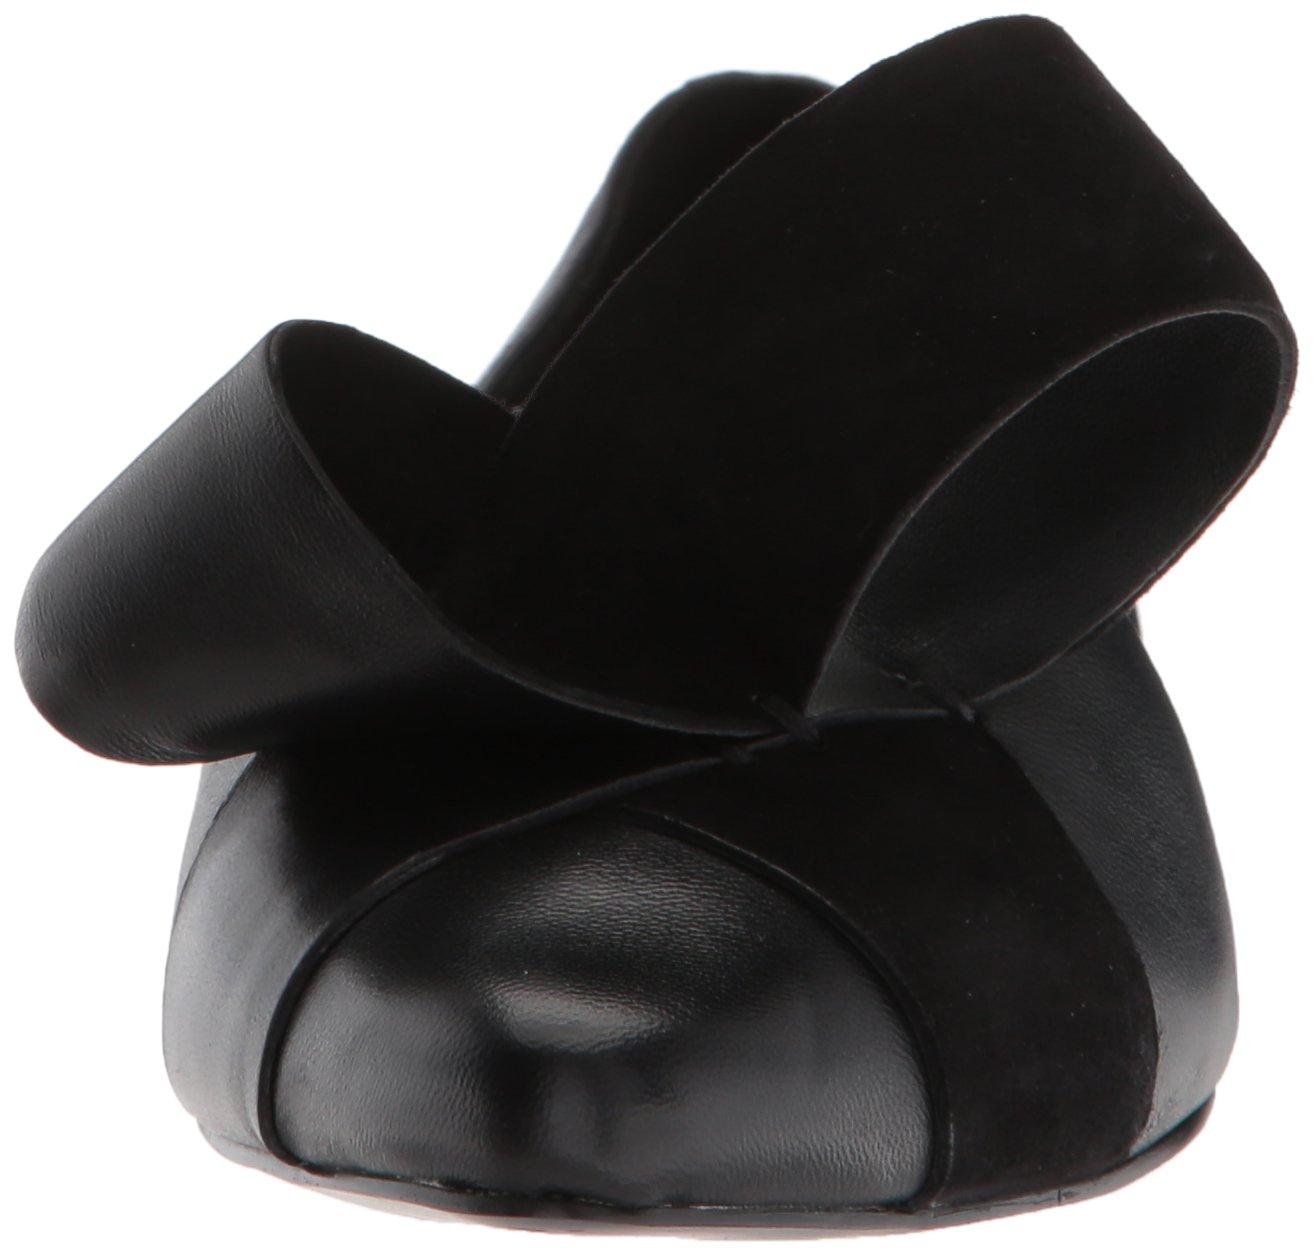 Nine West Women's Shoreside Leather Pump B072JMVR92 5.5 B(M) US|Black/Black Leather